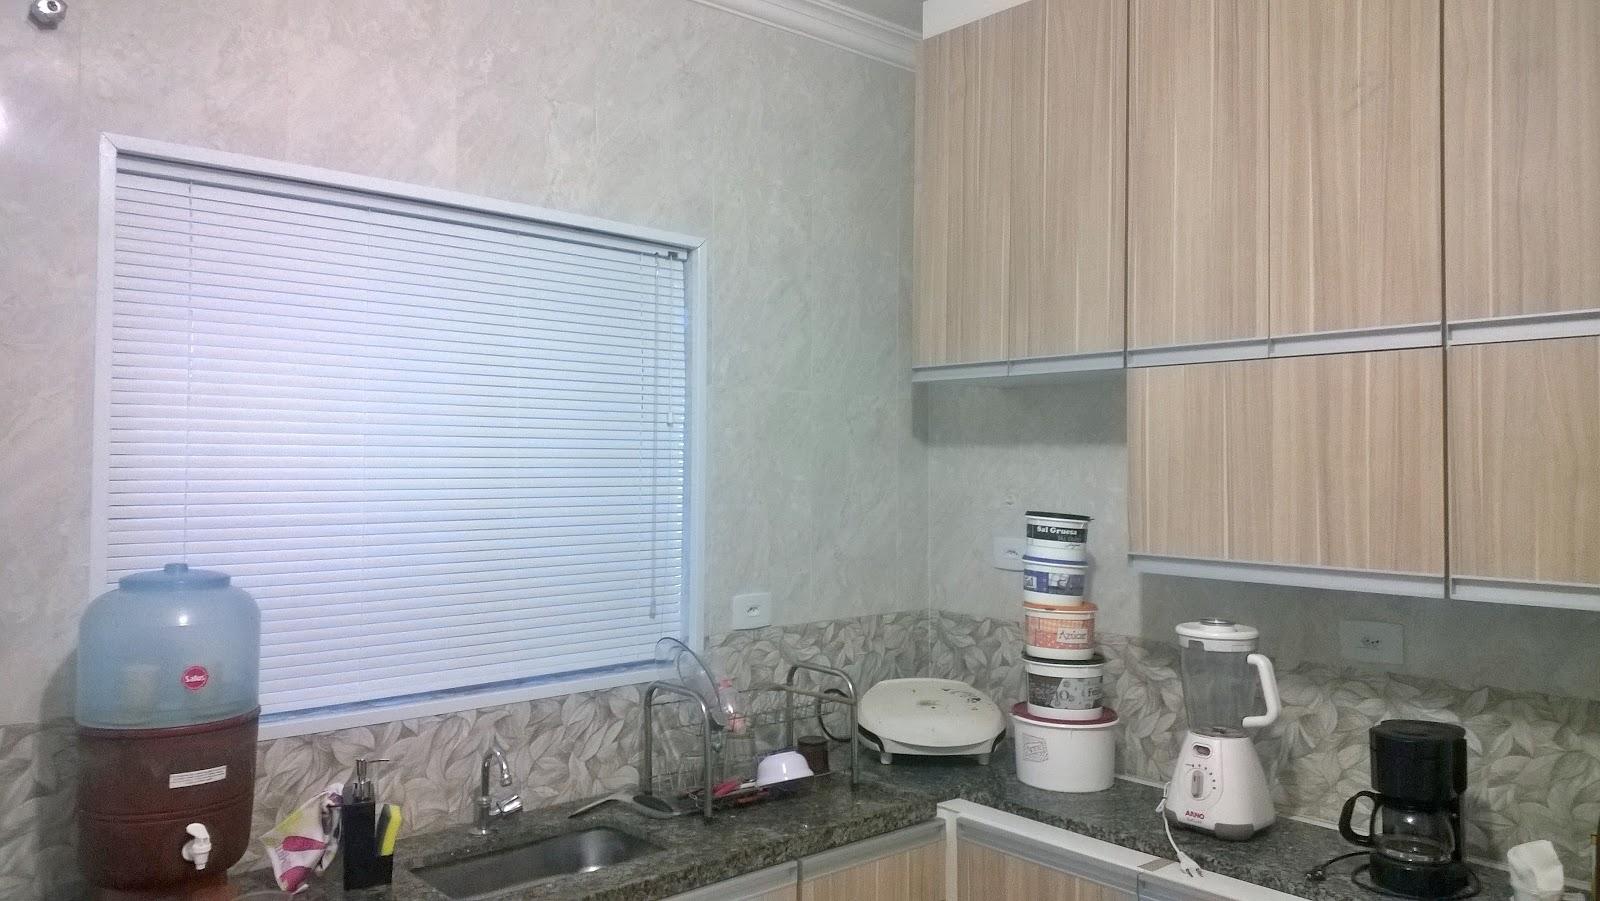 #536278 Persiana horizontal aluminio feito sob medida ideal pra cozinha  560 Janelas Em Aluminio Sob Medida